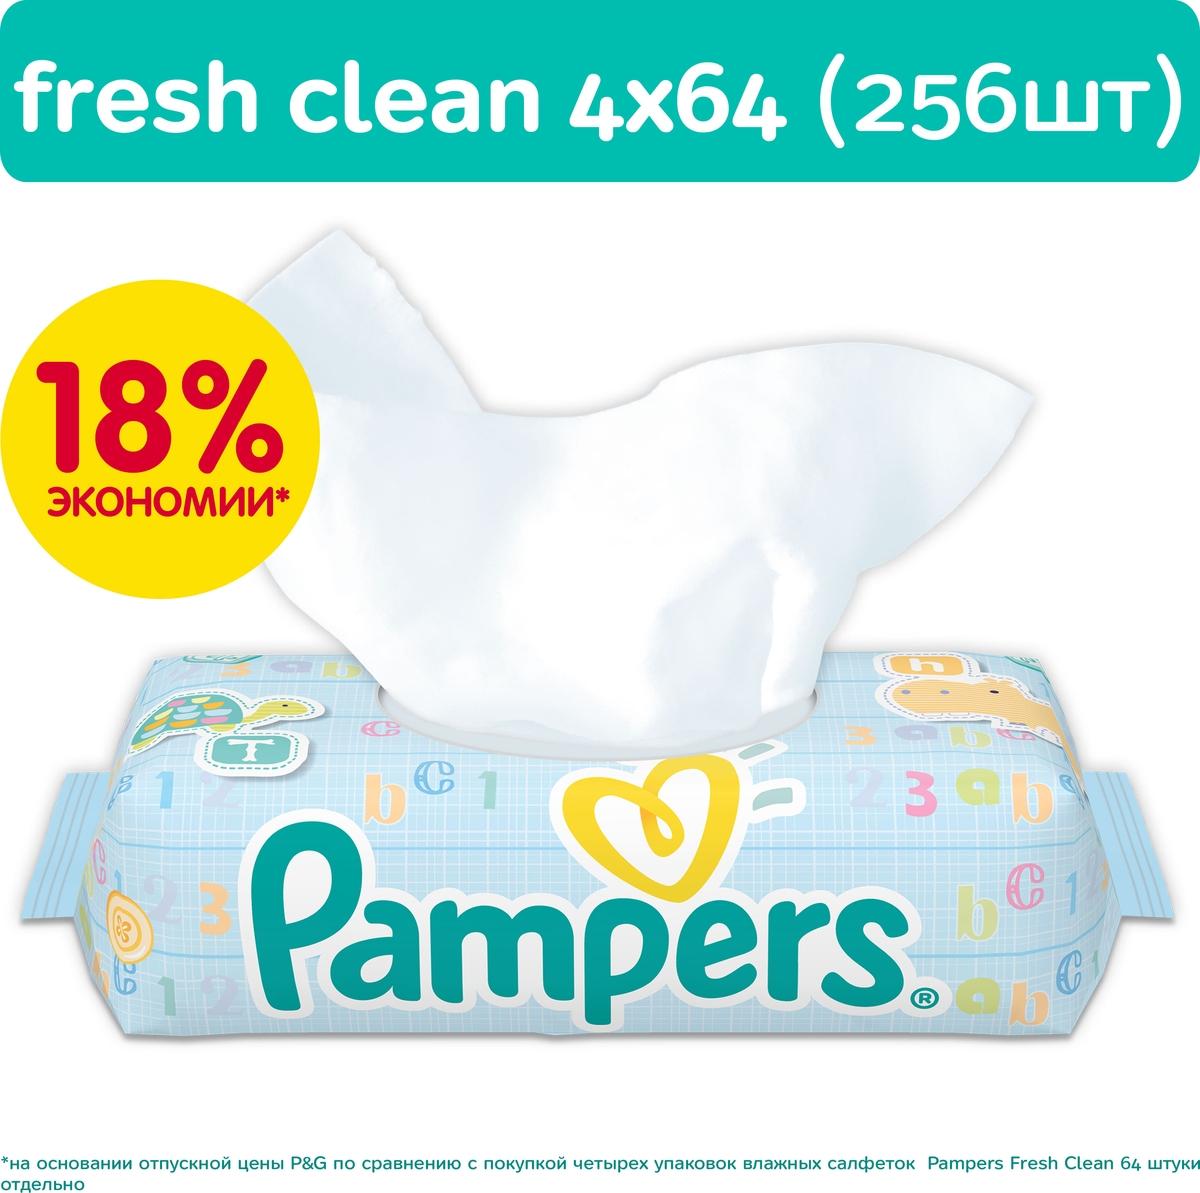 Pampers Детские влажные салфетки Baby Fresh Clean 256 шт